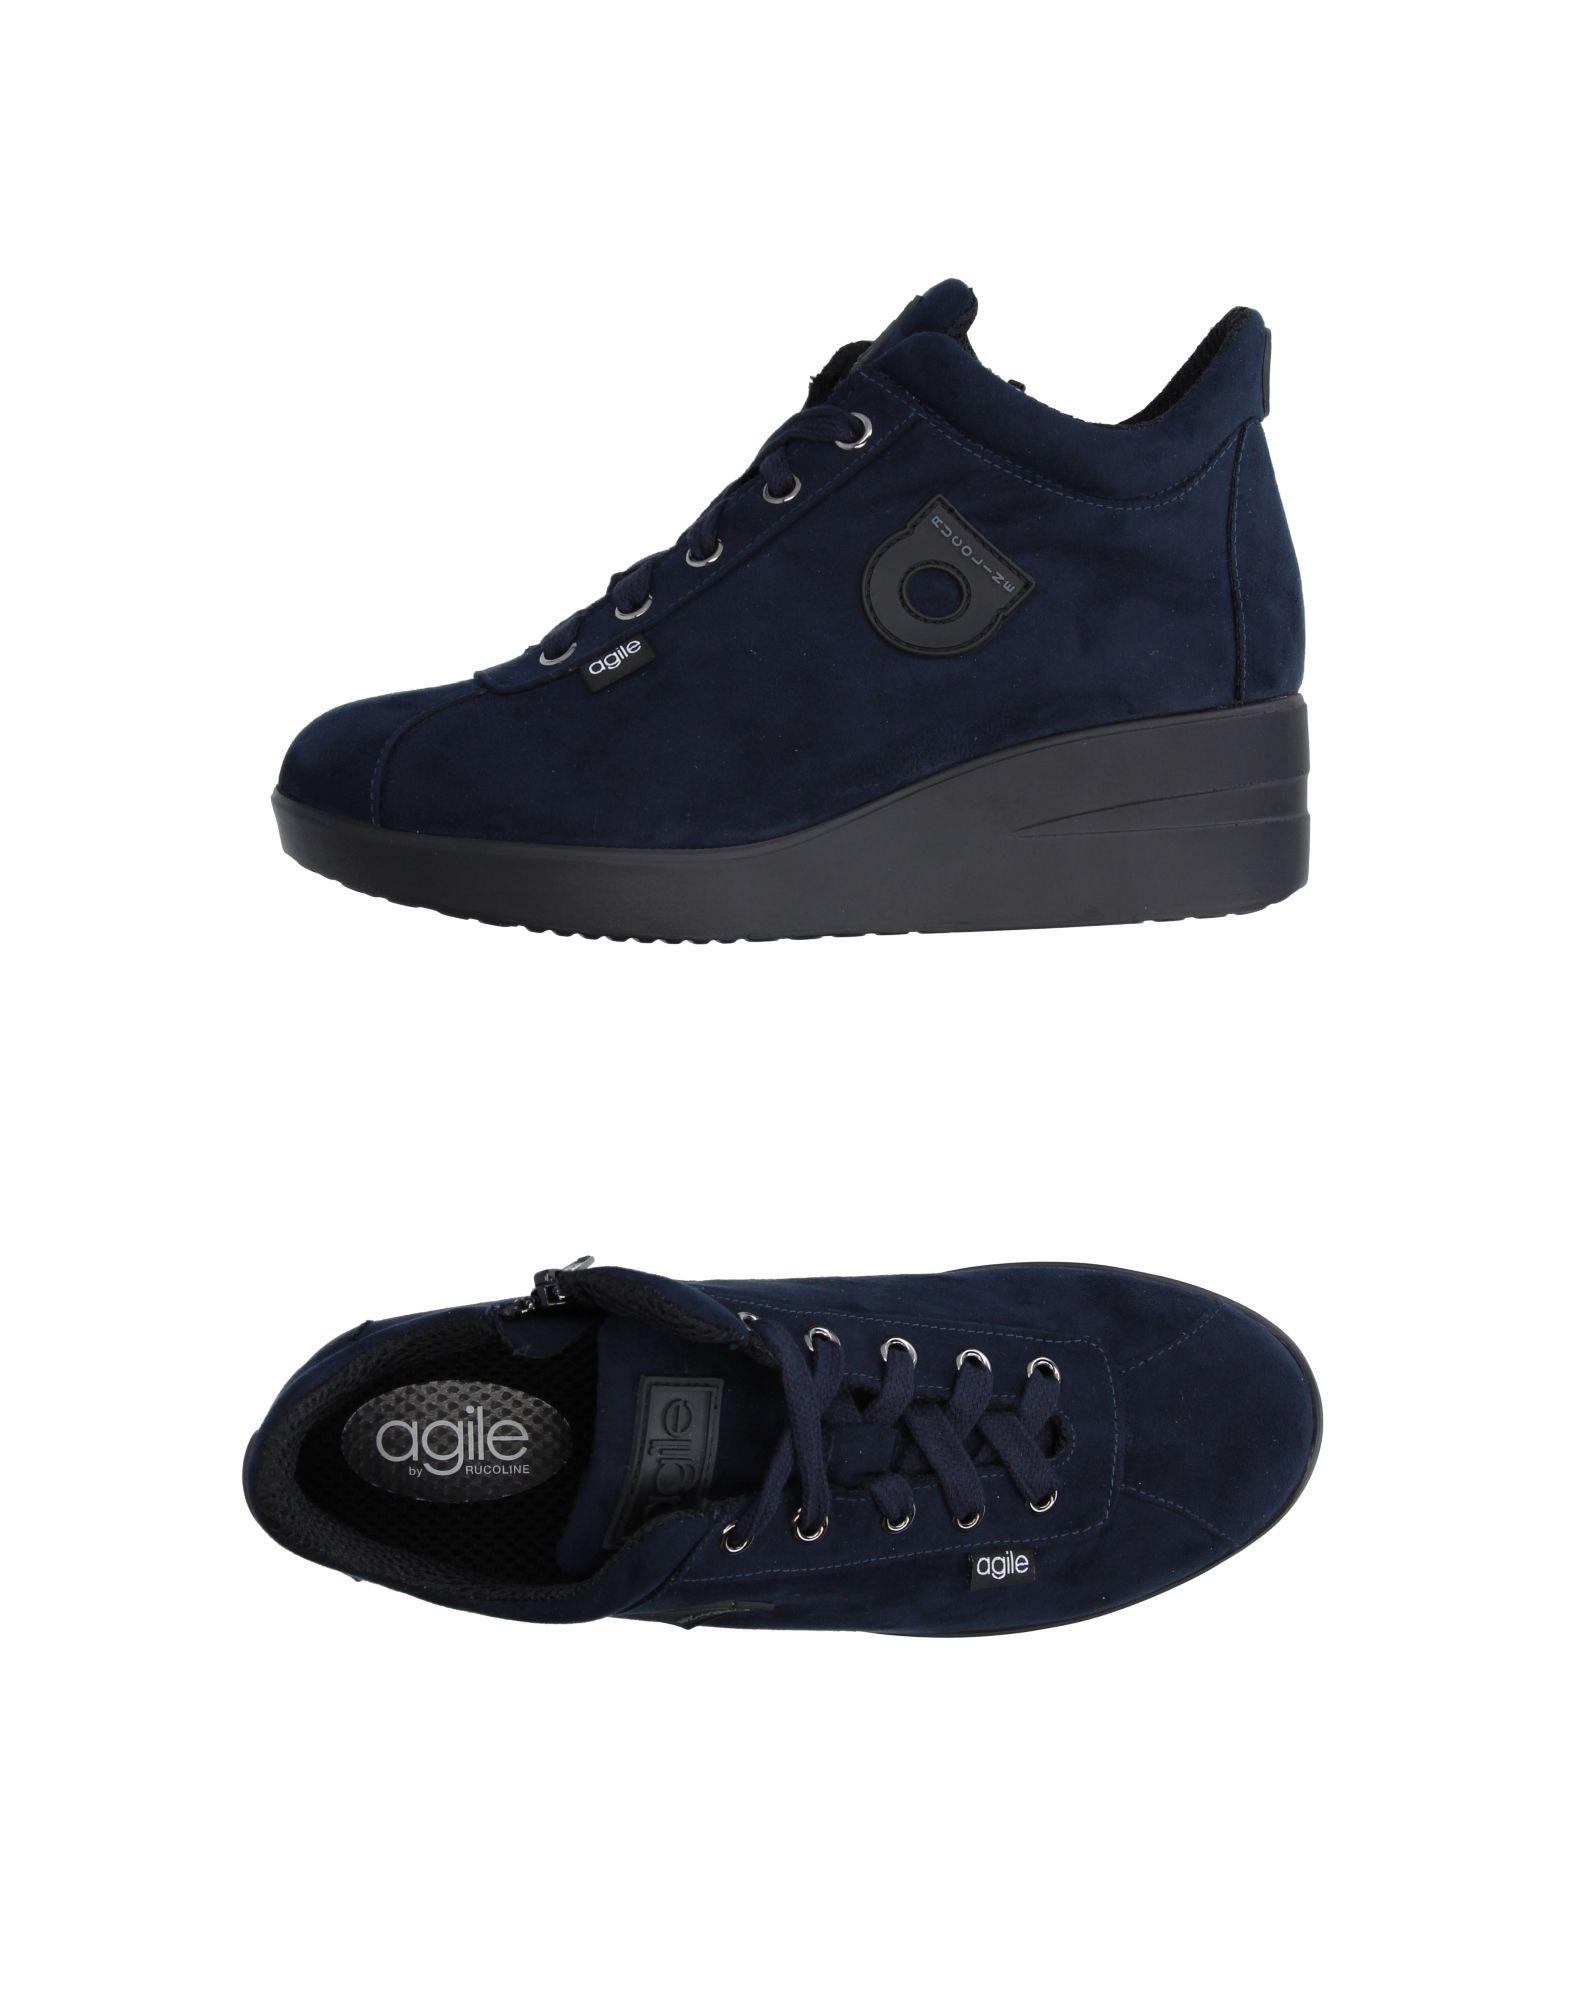 Agile By Rucoline Sneakers Damen  11222206EA Gute Qualität beliebte Schuhe